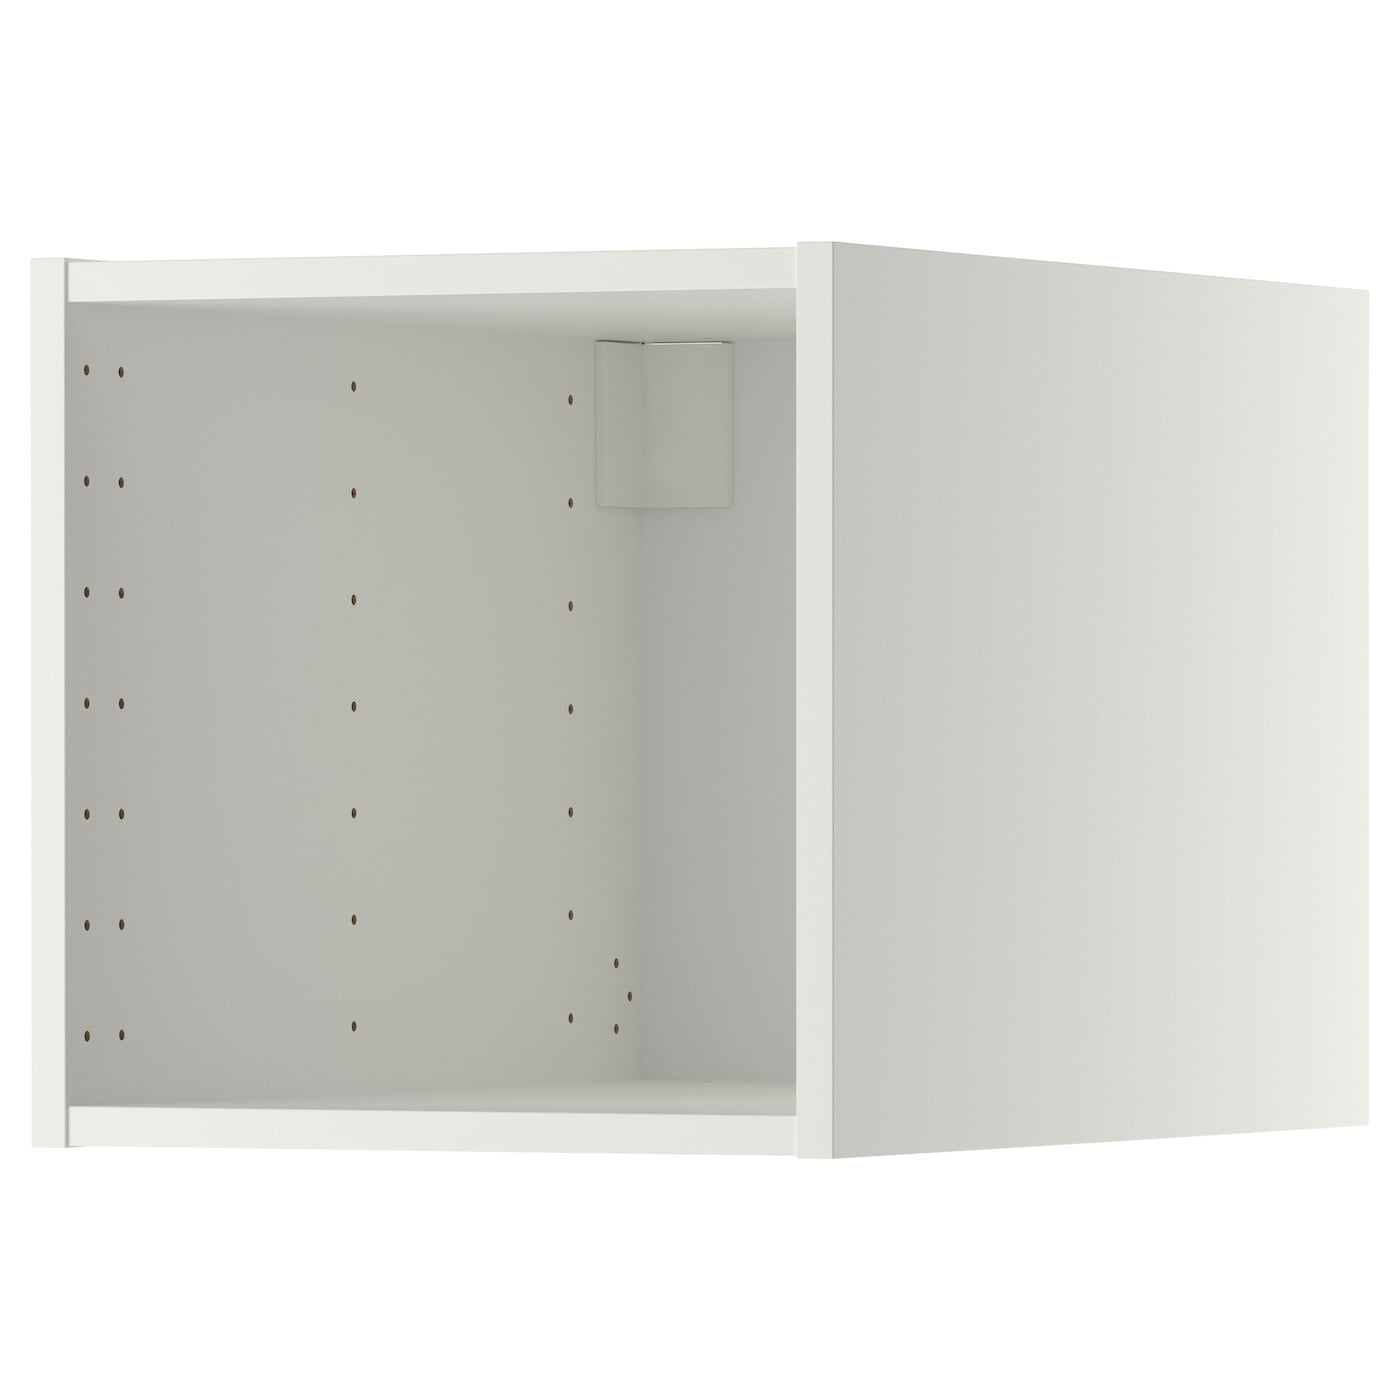 kitchen cabinets kitchen units ikea. Black Bedroom Furniture Sets. Home Design Ideas